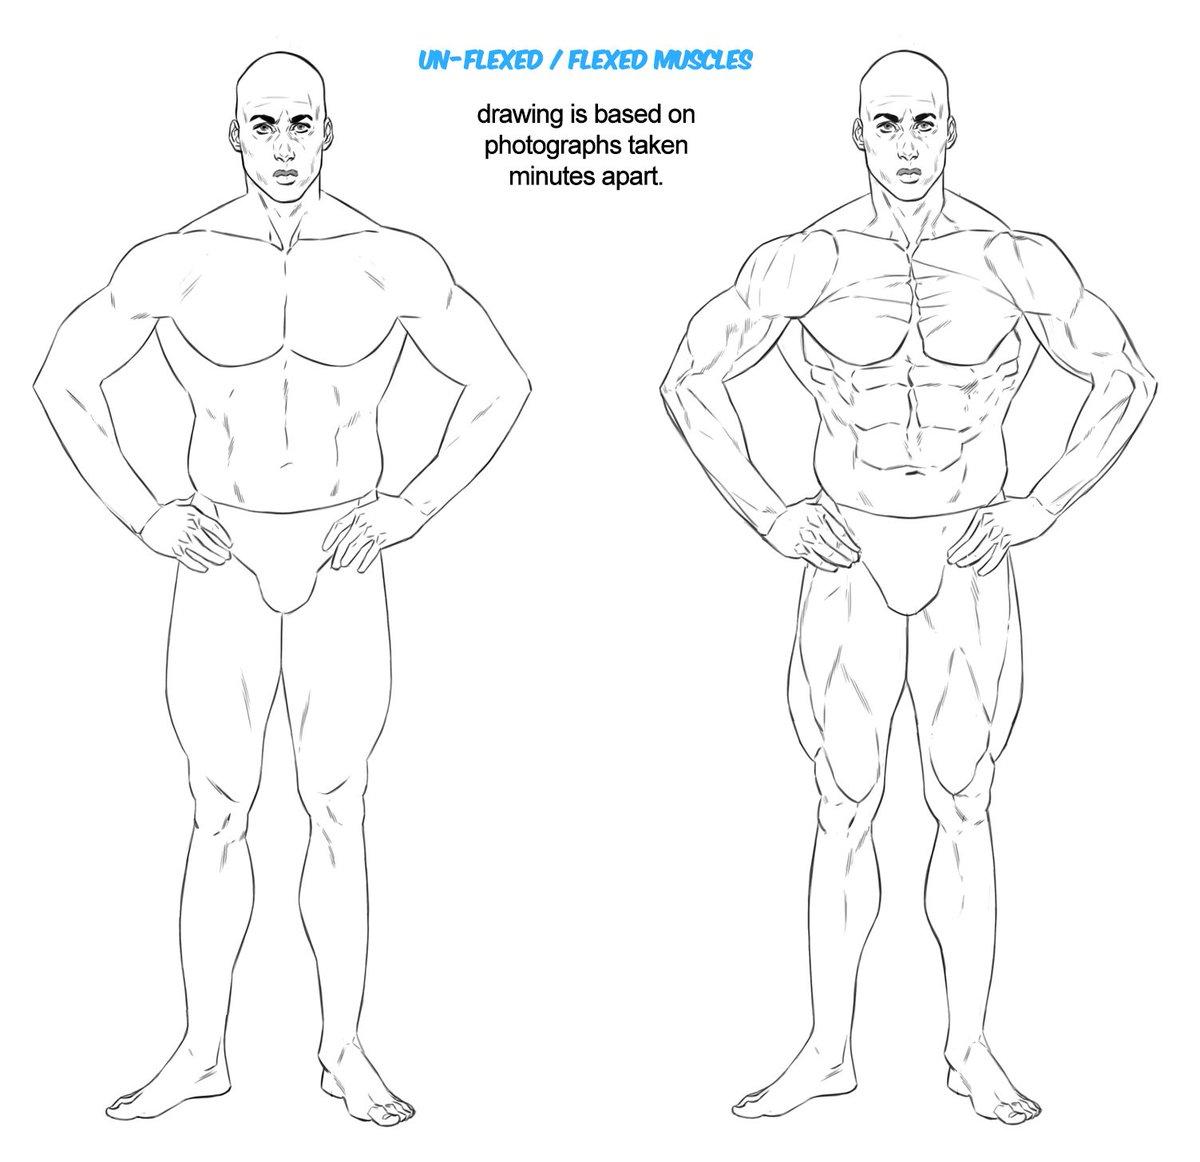 Masters of Anatomy (@MasterAnatomy) | Twitter